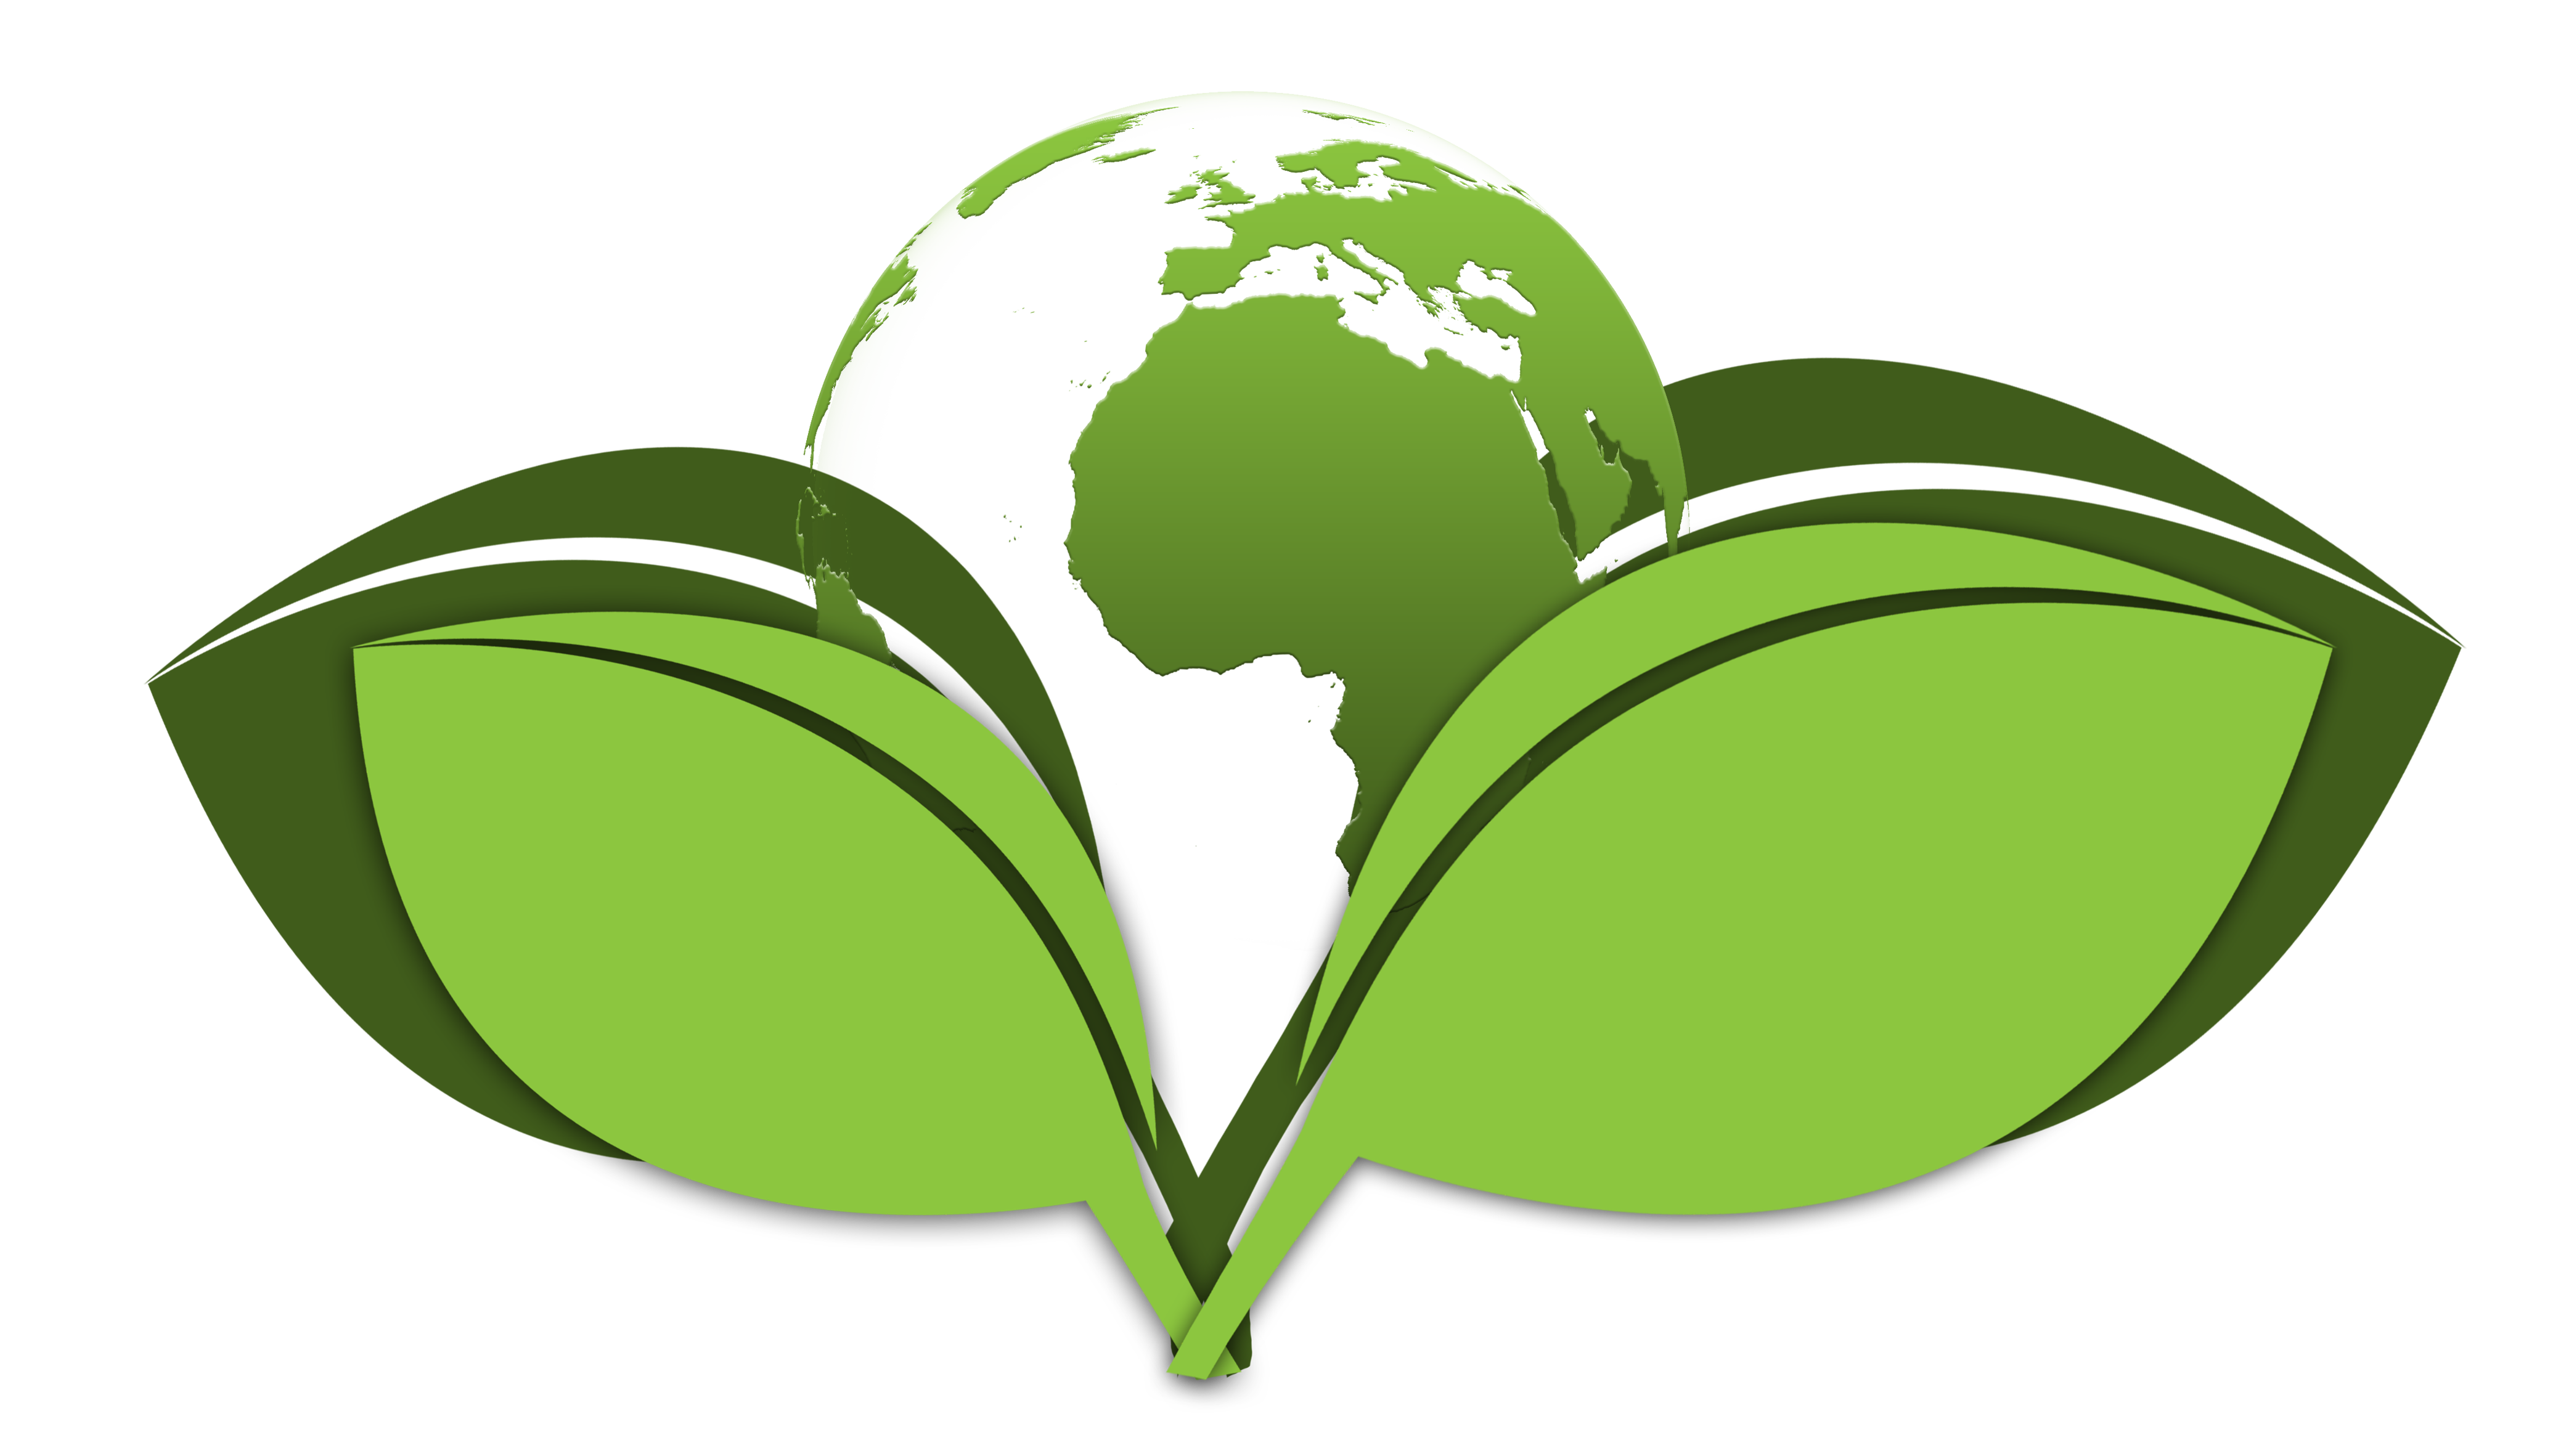 Environment clipart environmental safety, Environment.